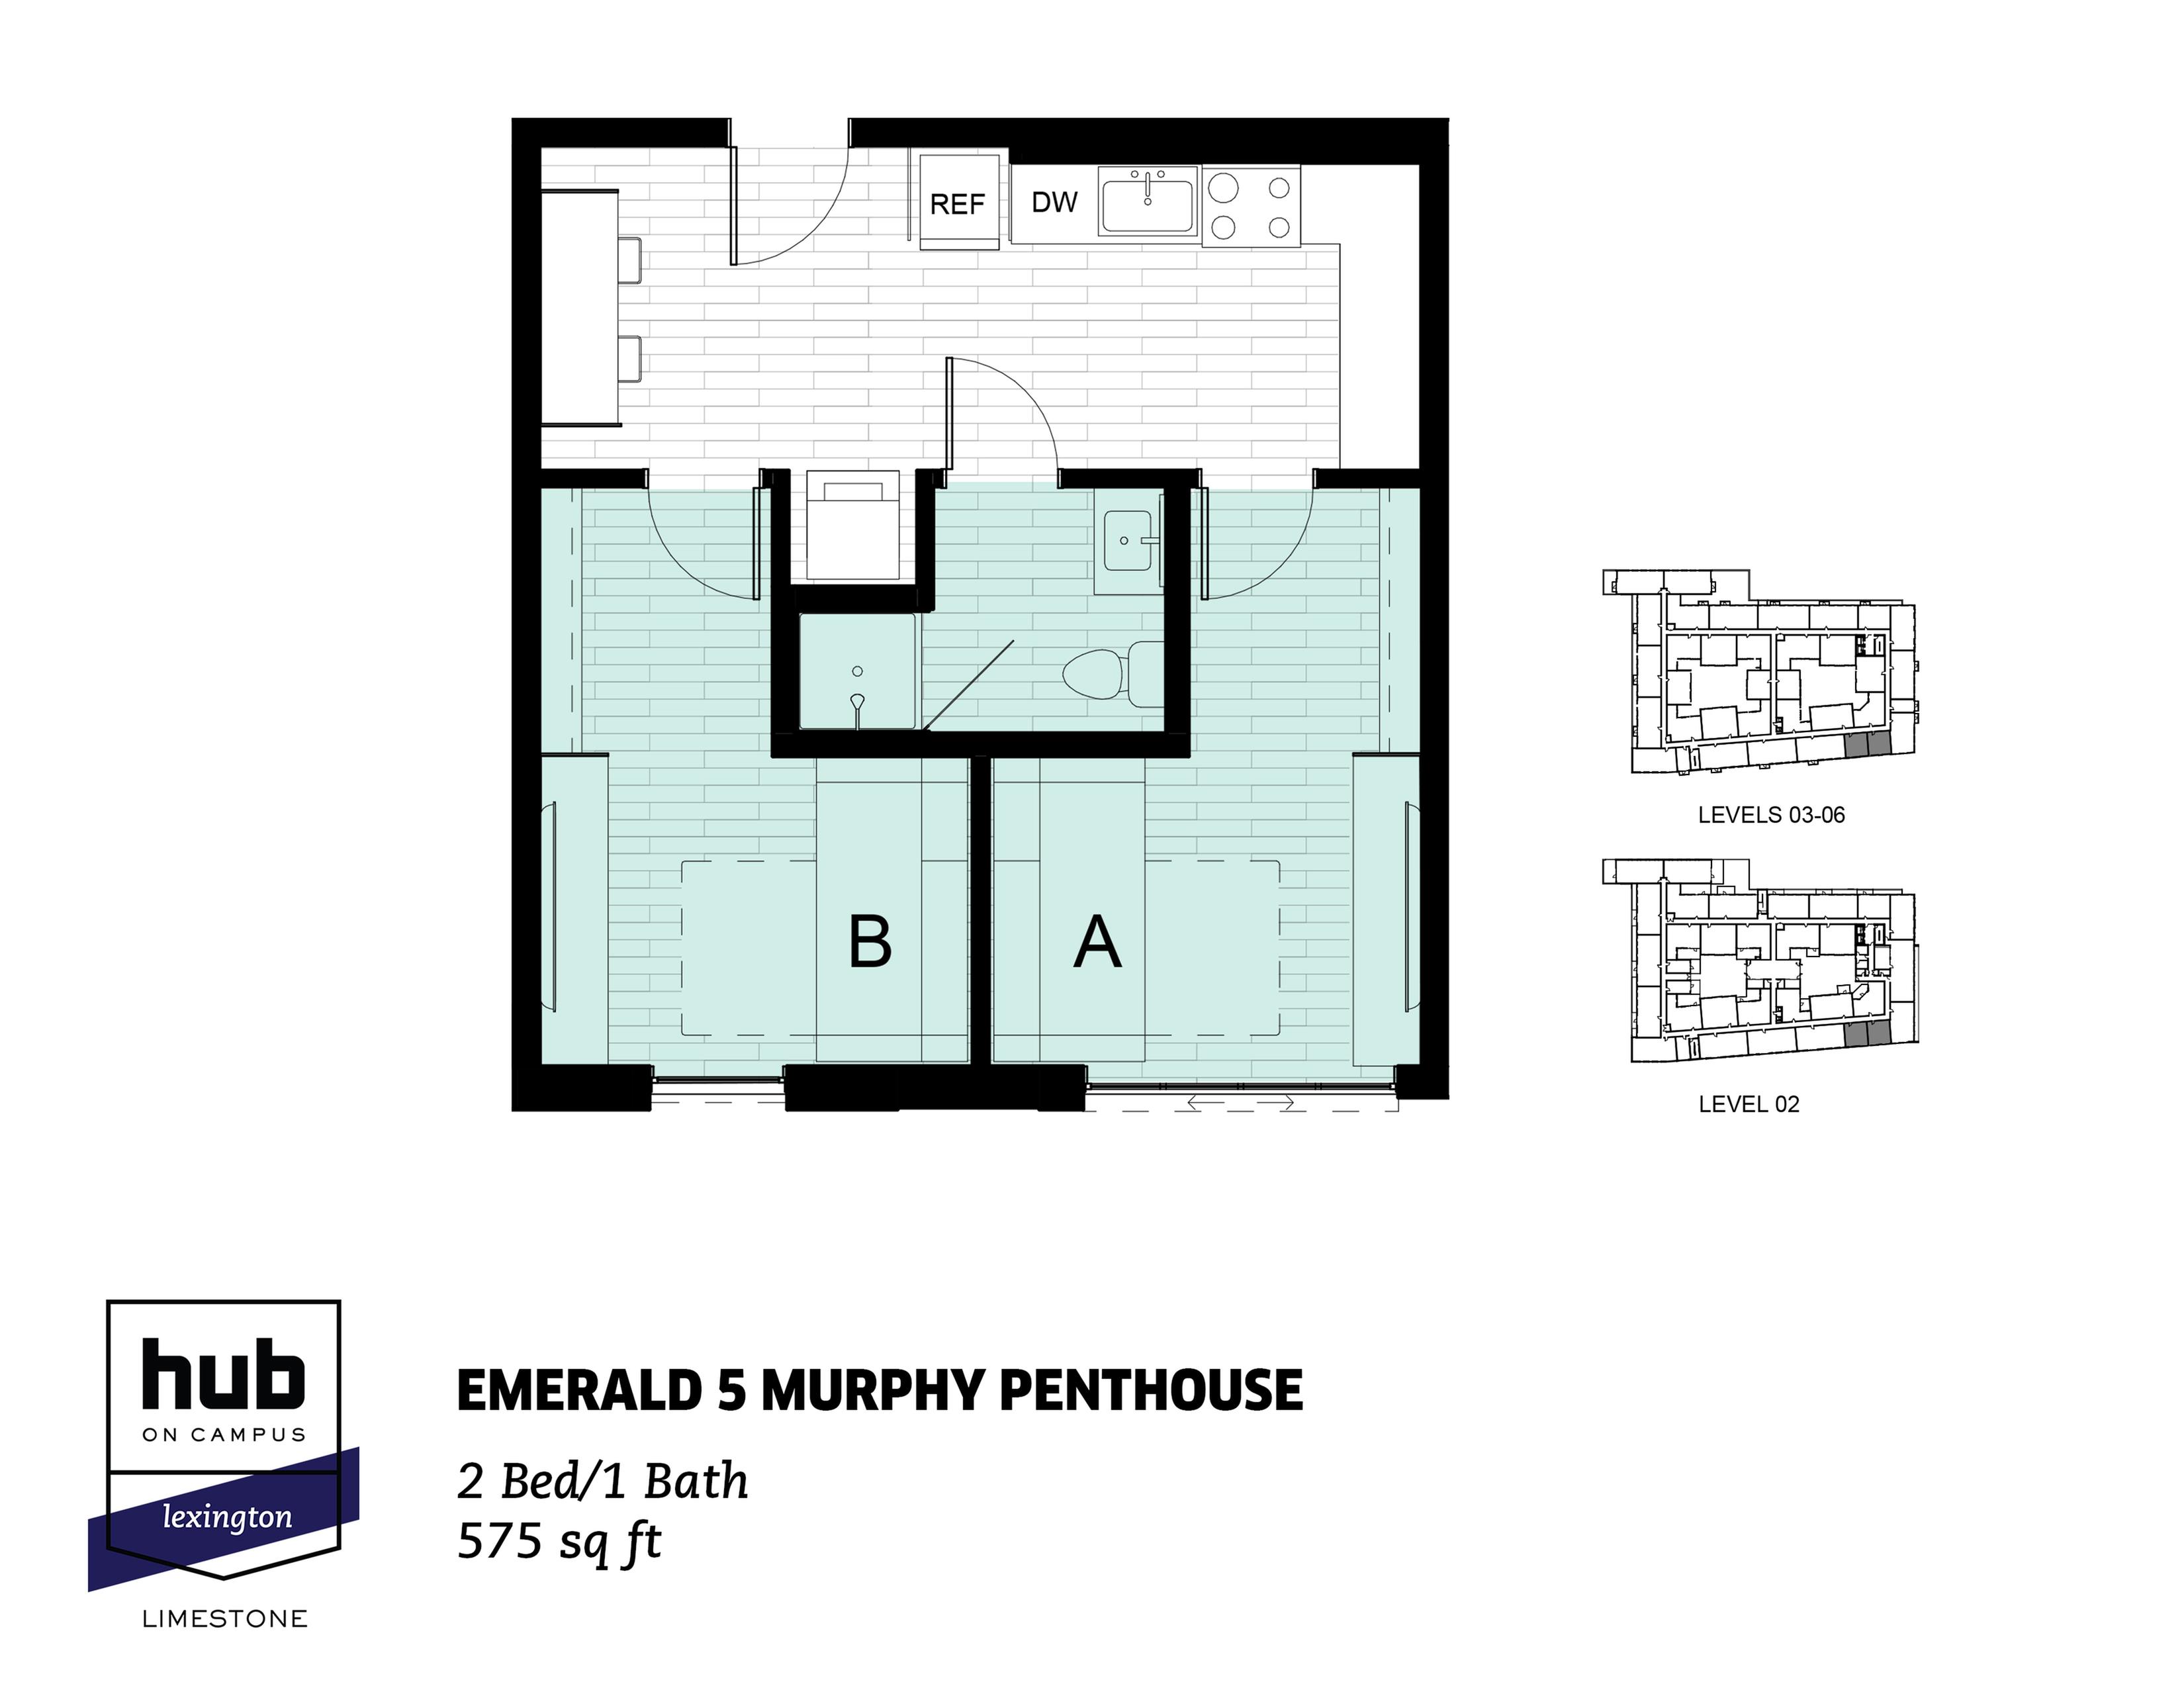 Emerald 5 Murphy Penthouse